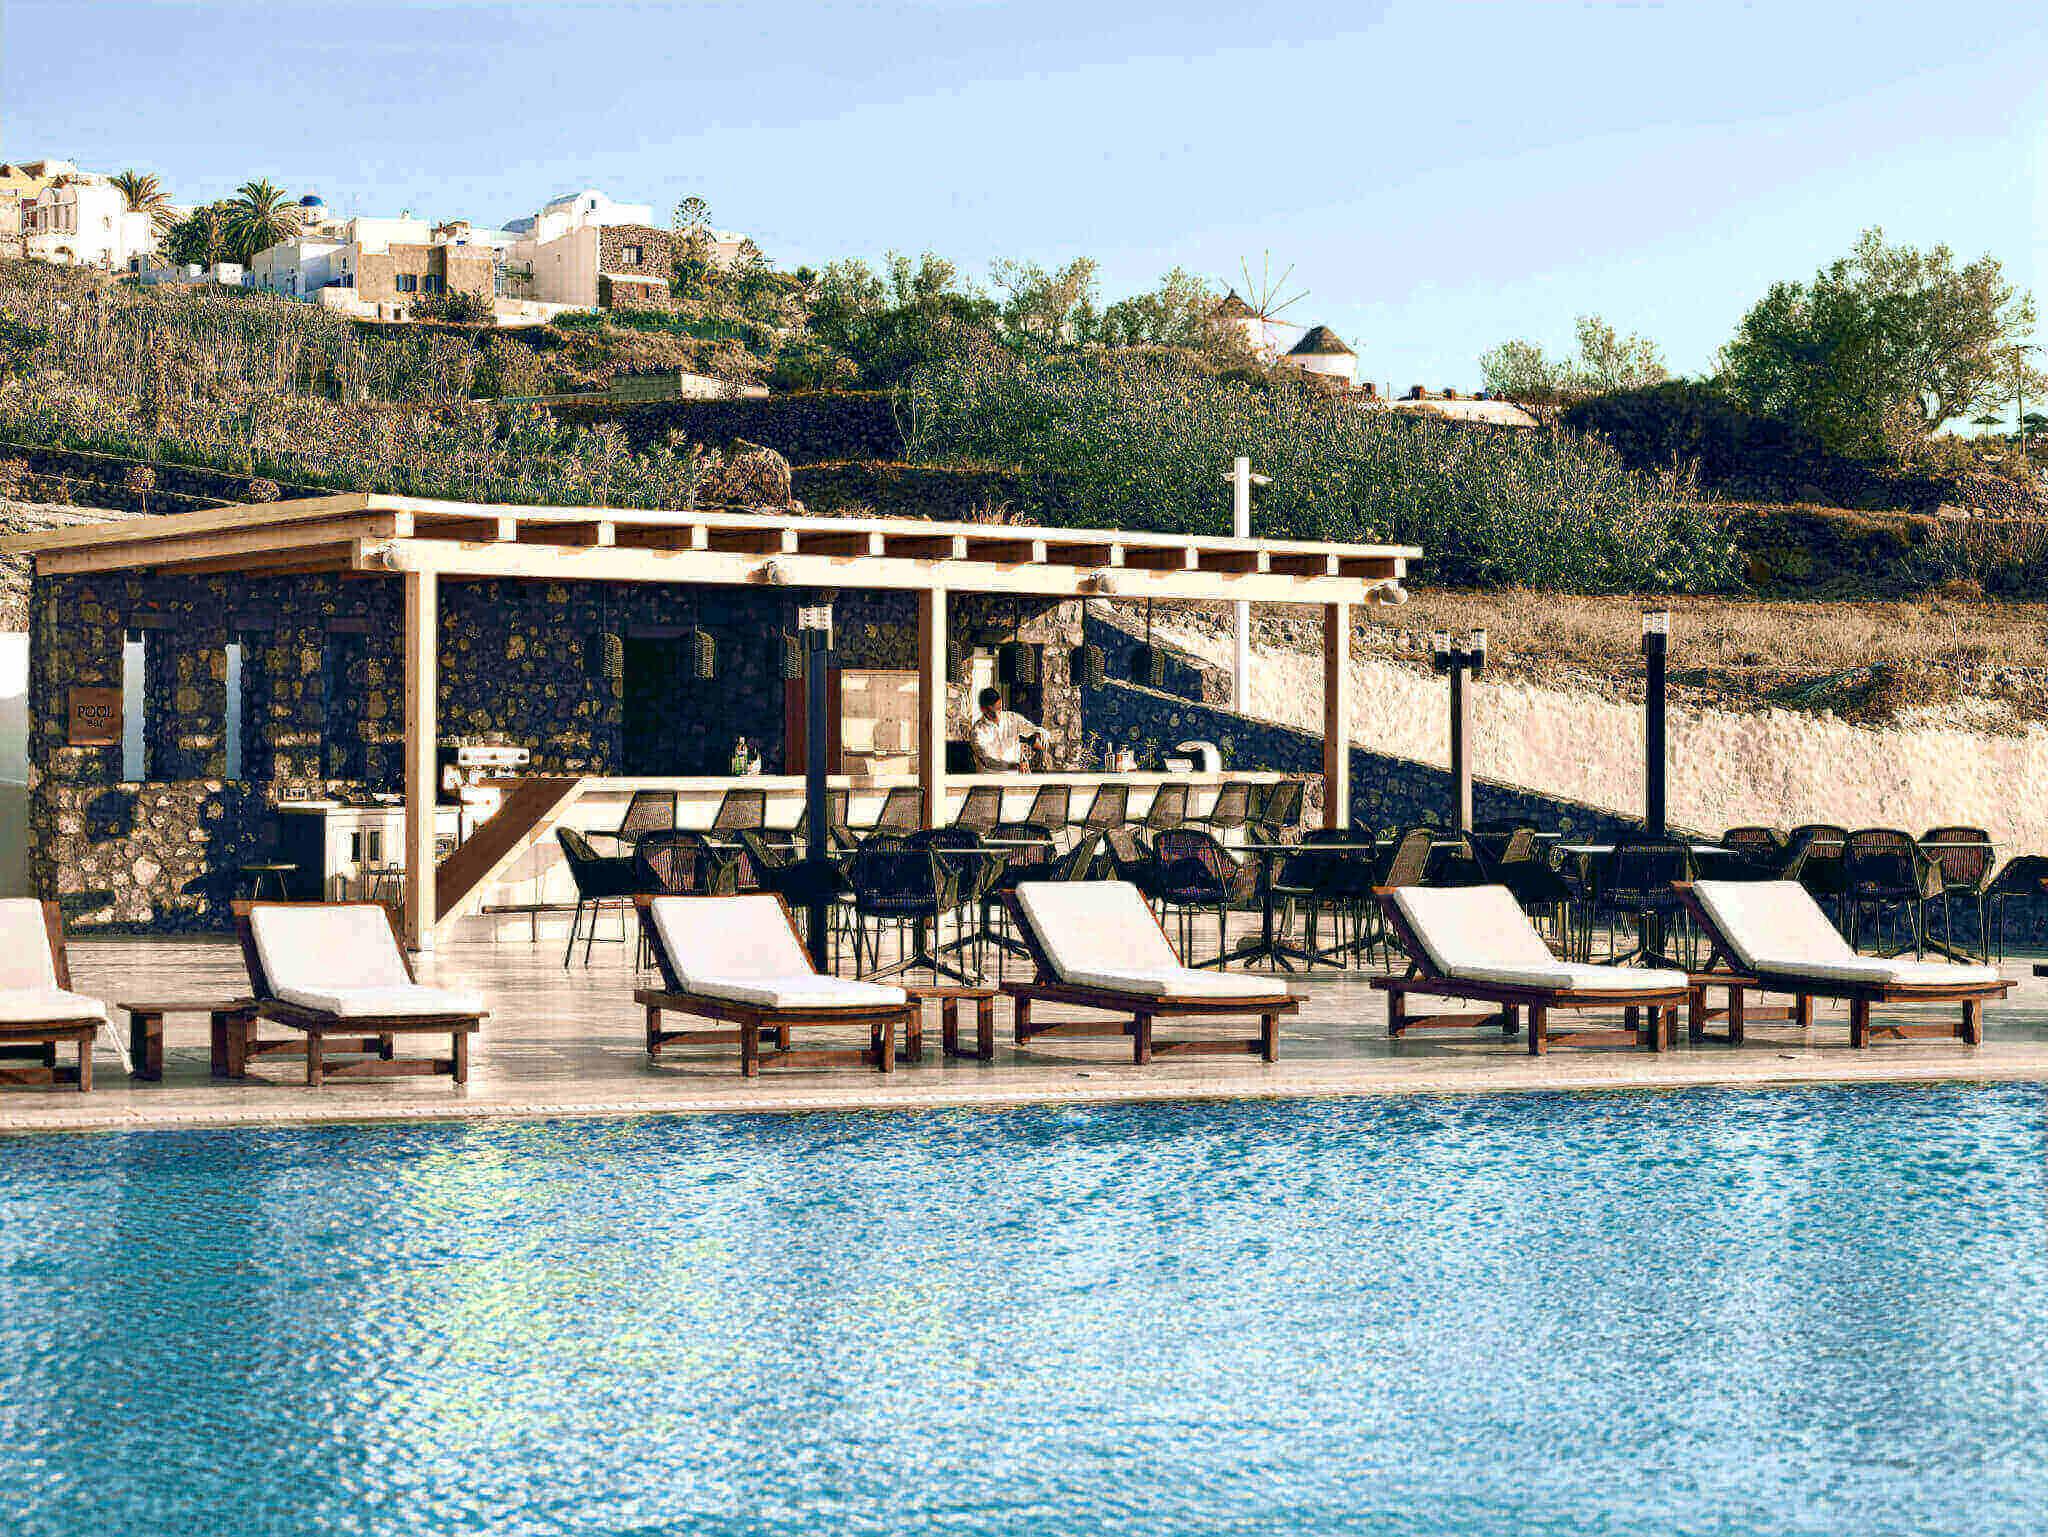 Akratos Poolside Lounge Bar